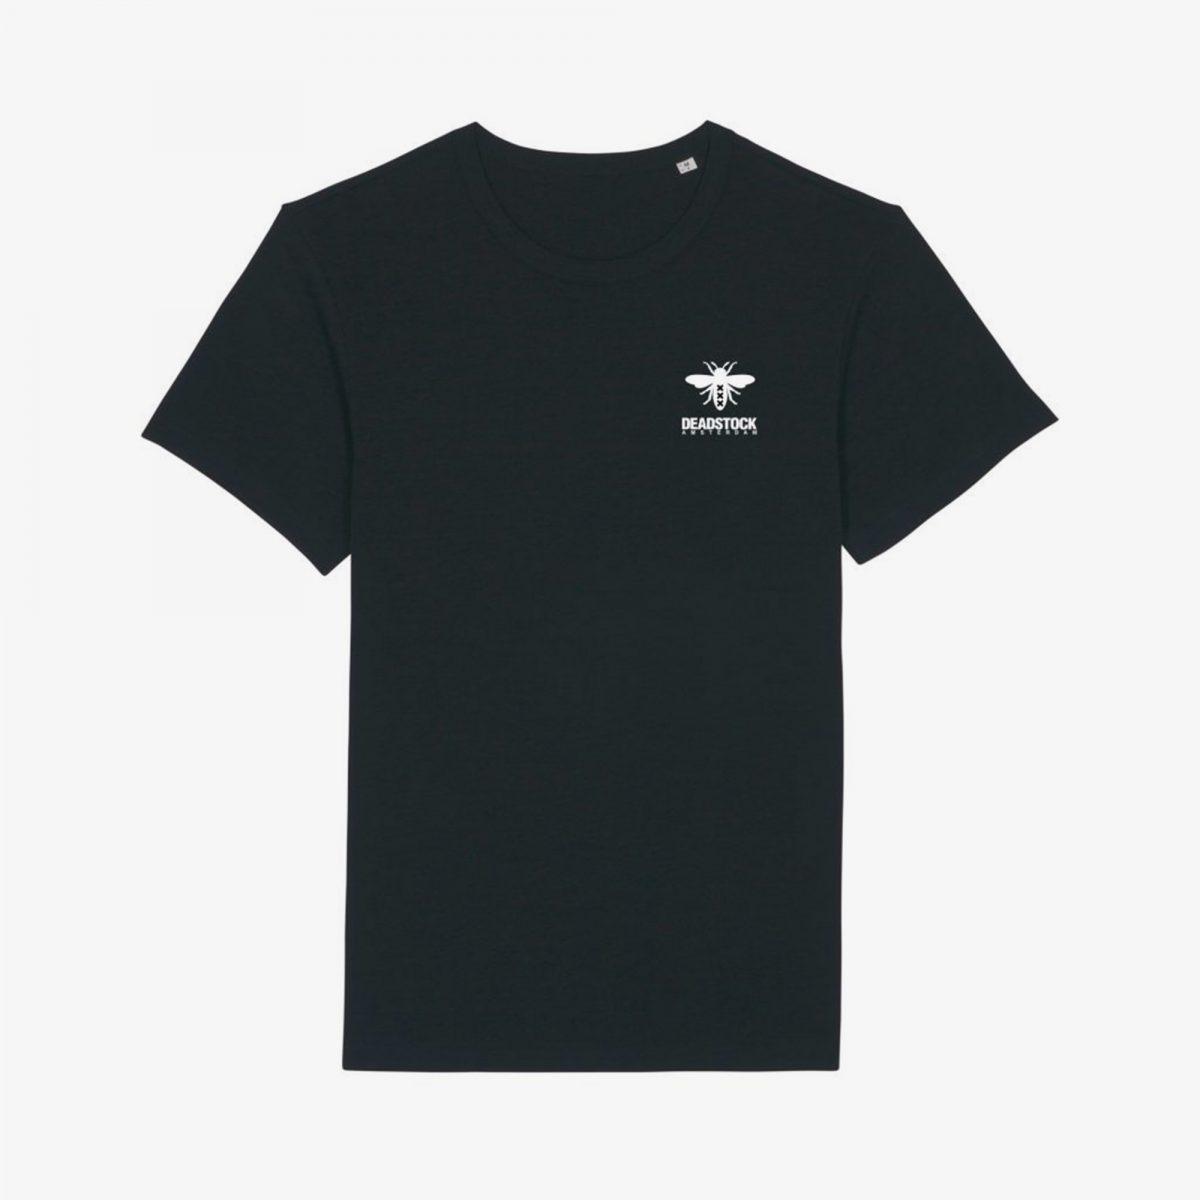 Heavy-Black-TShirt-Front-Grey-Background